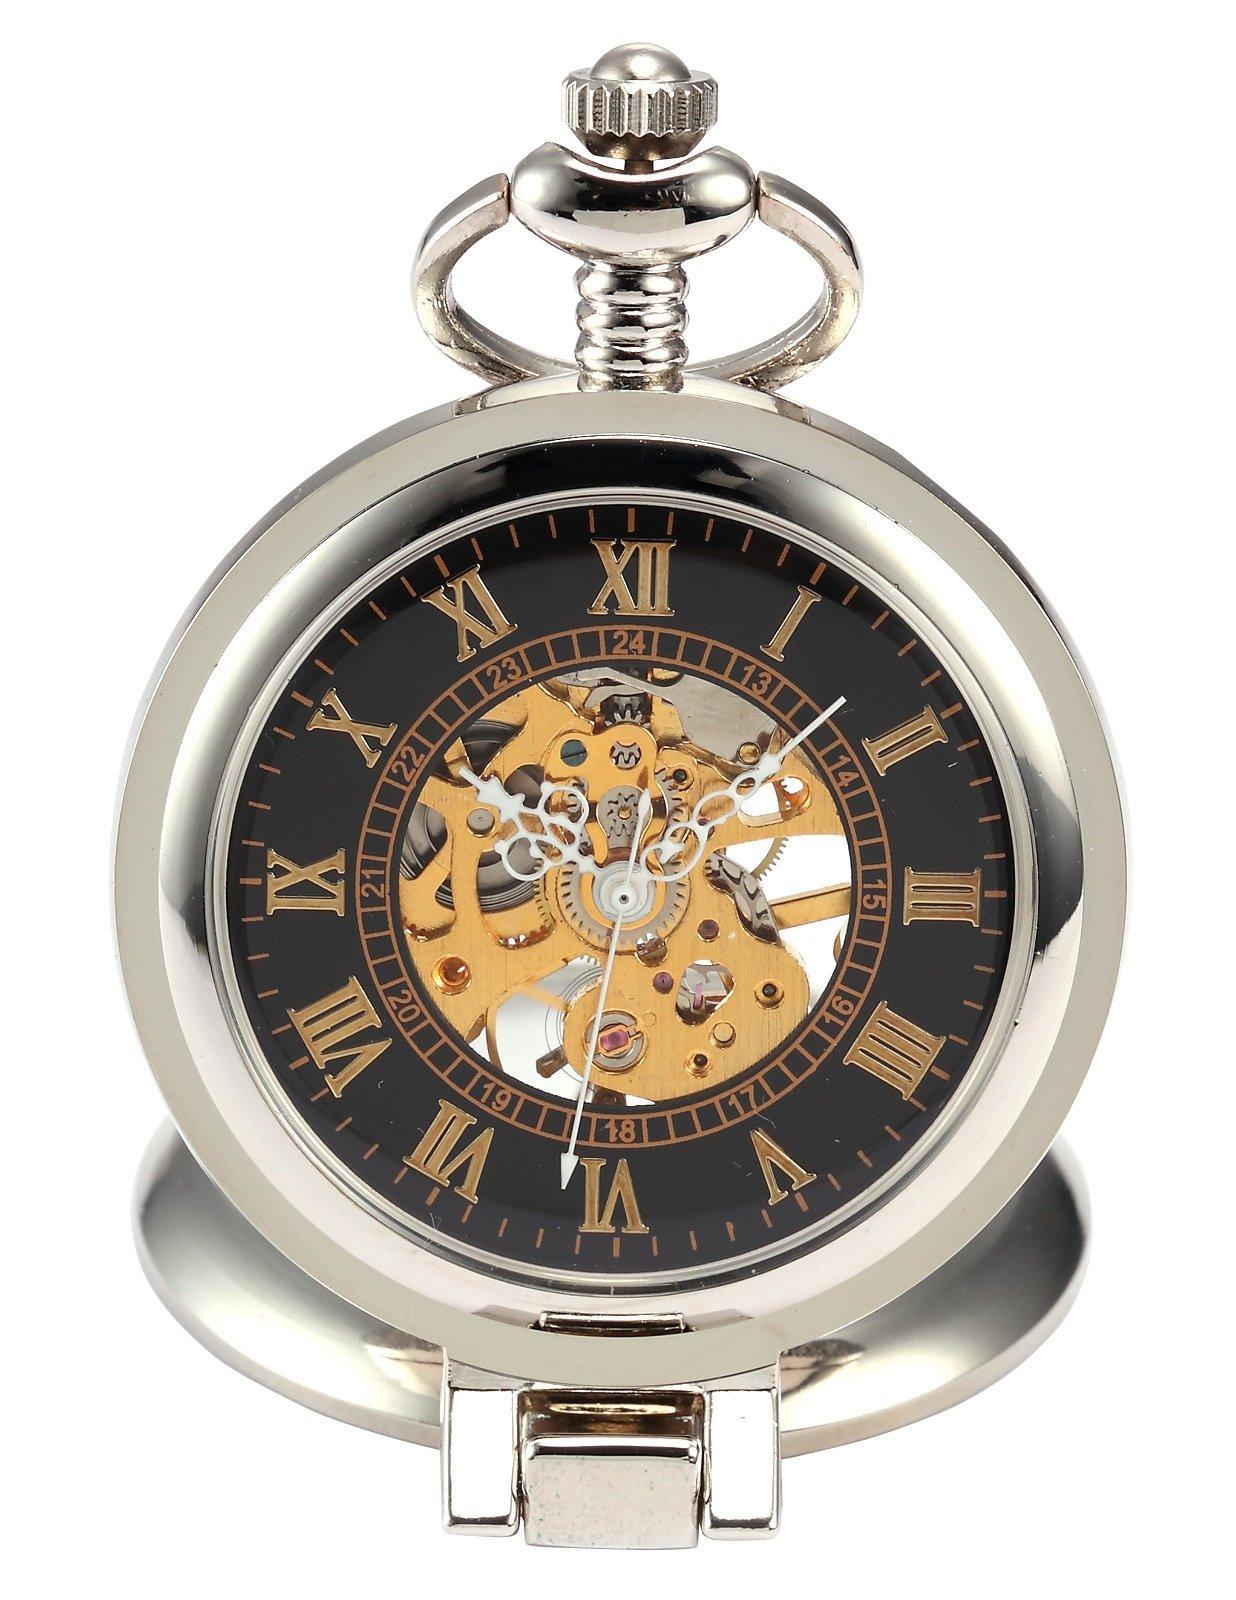 AMPM24 Unique Men Women Magnifier Skeleton Mechanical Hand Wind Pocket Watch with Chain WPK023